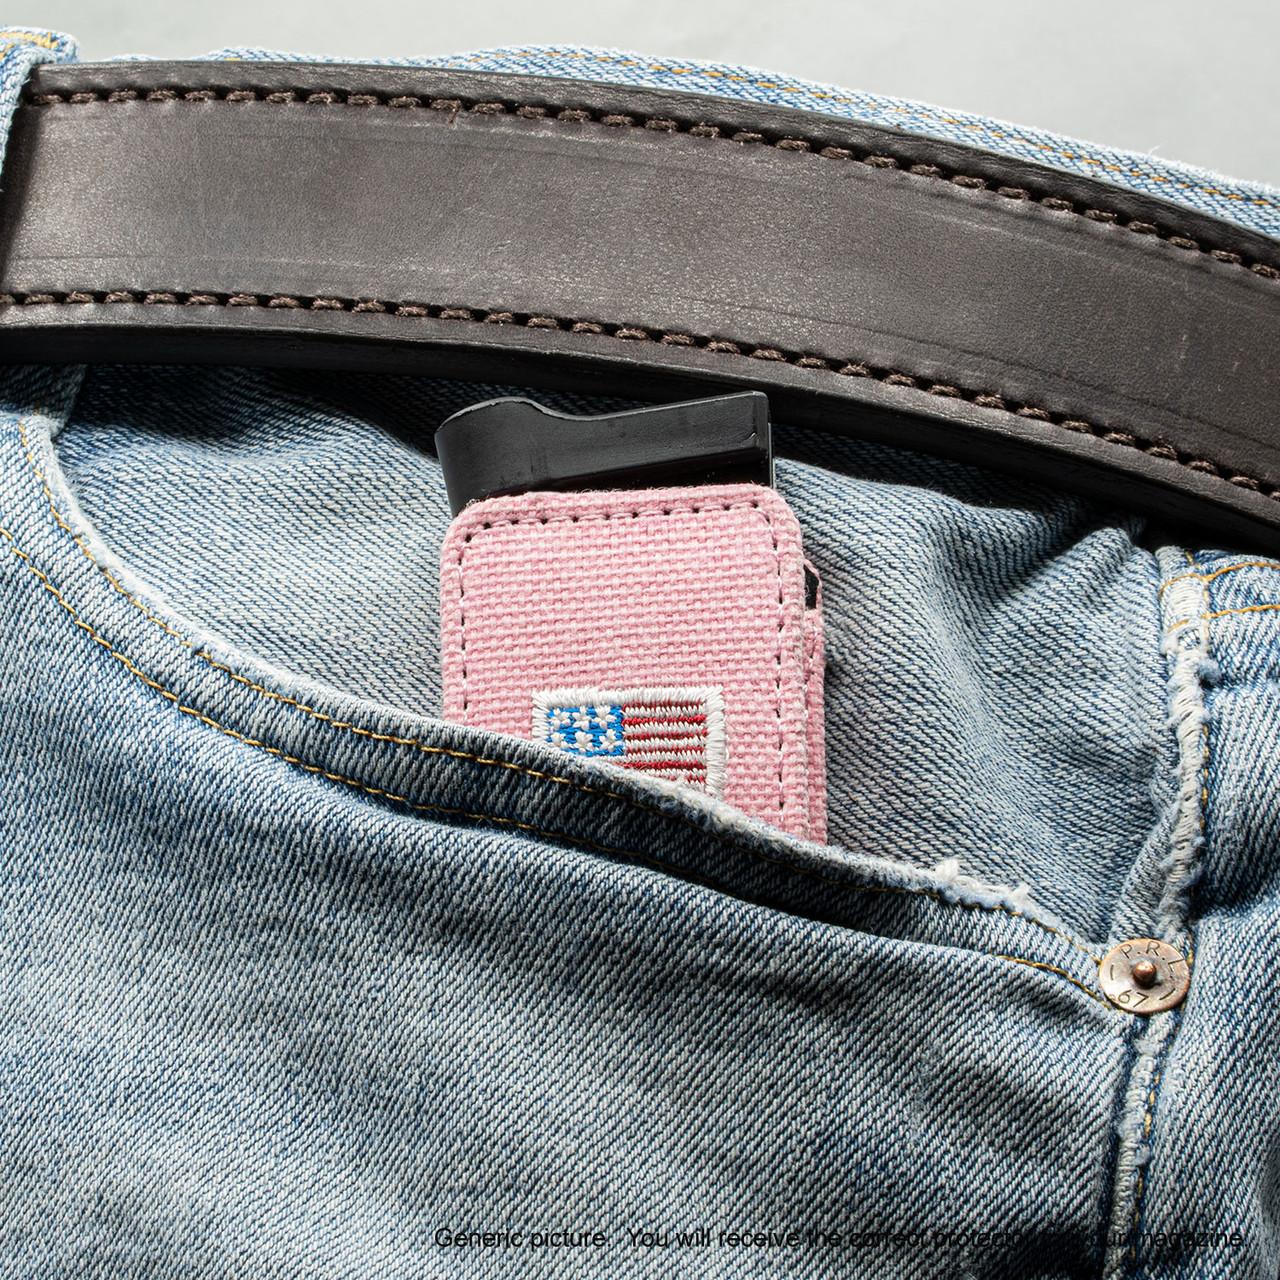 Taurus G3 Pink Canvas Flag Magazine Pocket Protector